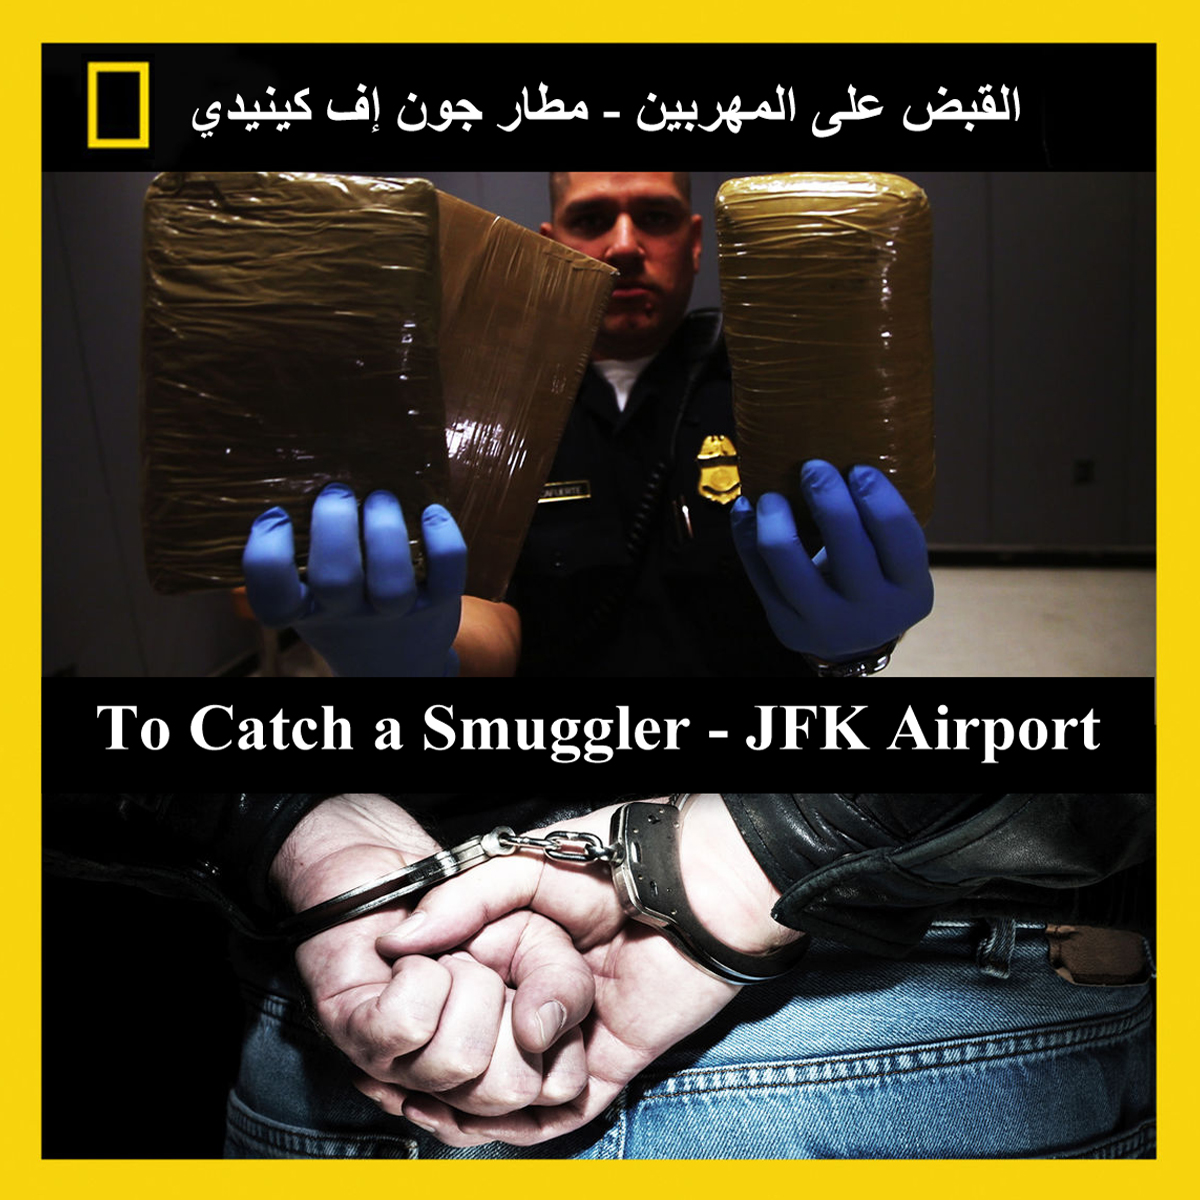 HDTV-1080p | القبض على المهربين: مطار جون إف كينيدي - ساعي المخدرات -- Seeders: 1 -- Leechers: 0